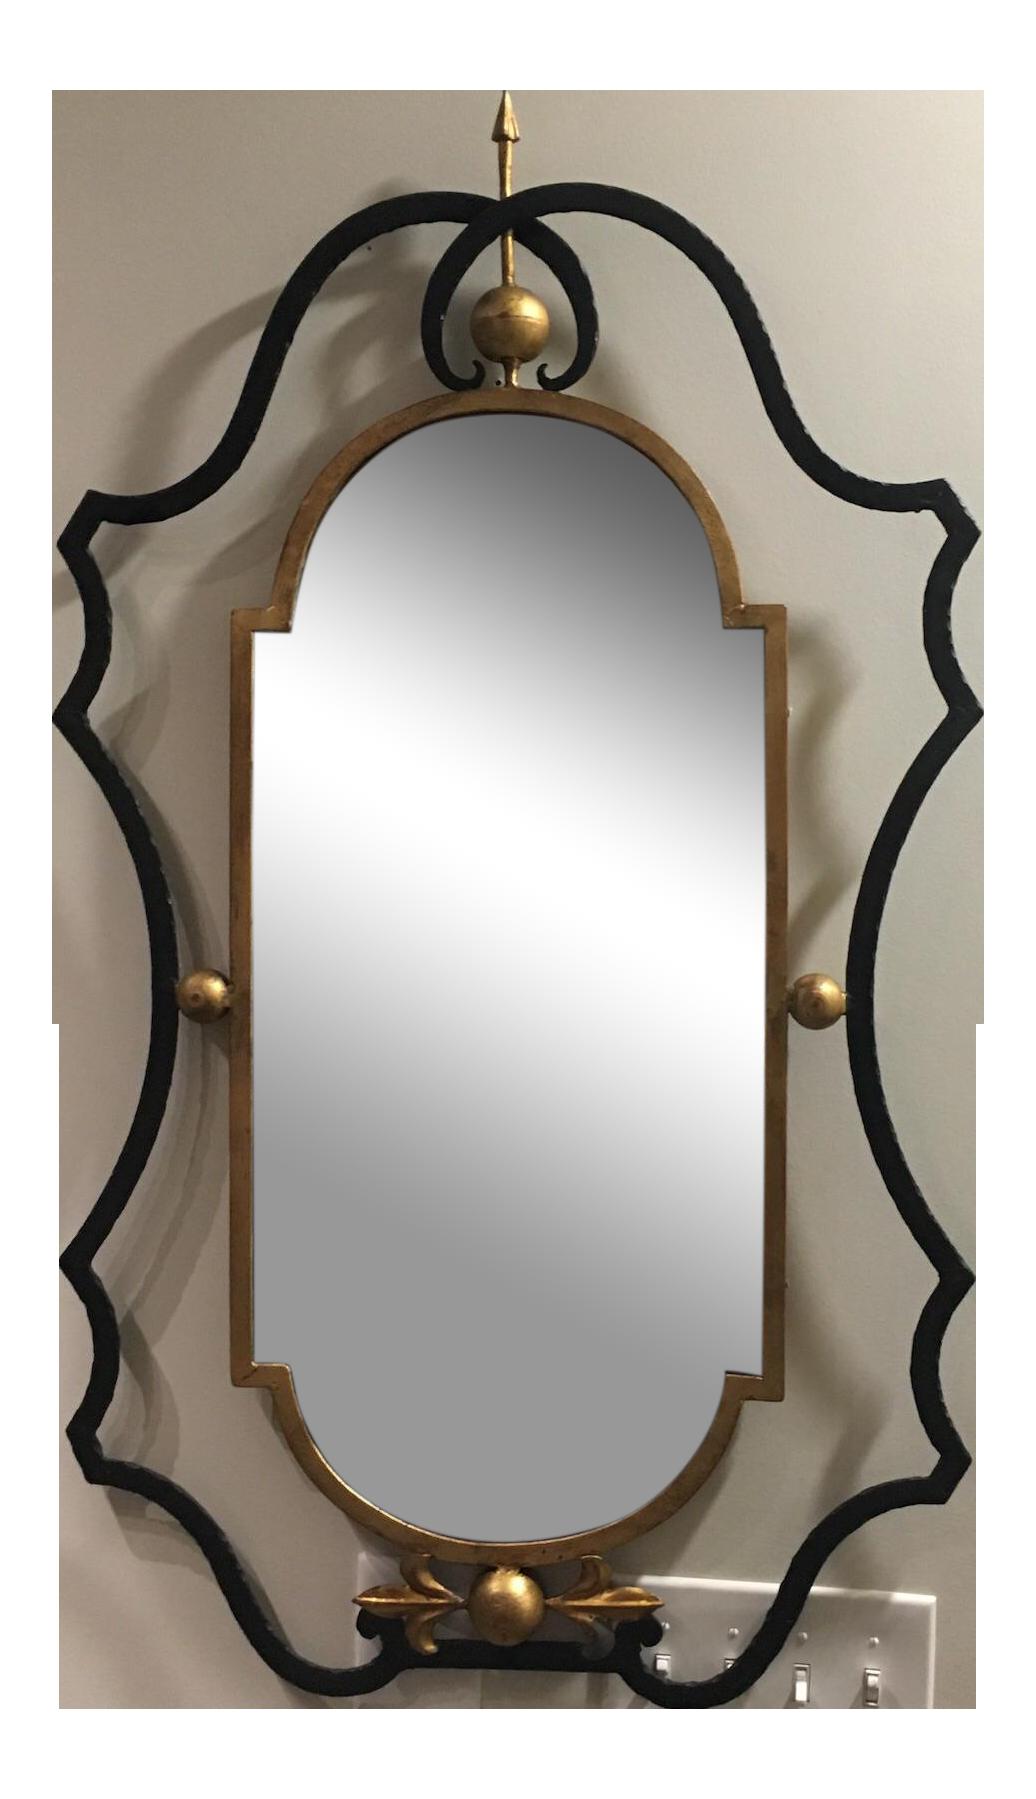 Mirror clipart rectangular mirror. Gilbert poillerat style wrought